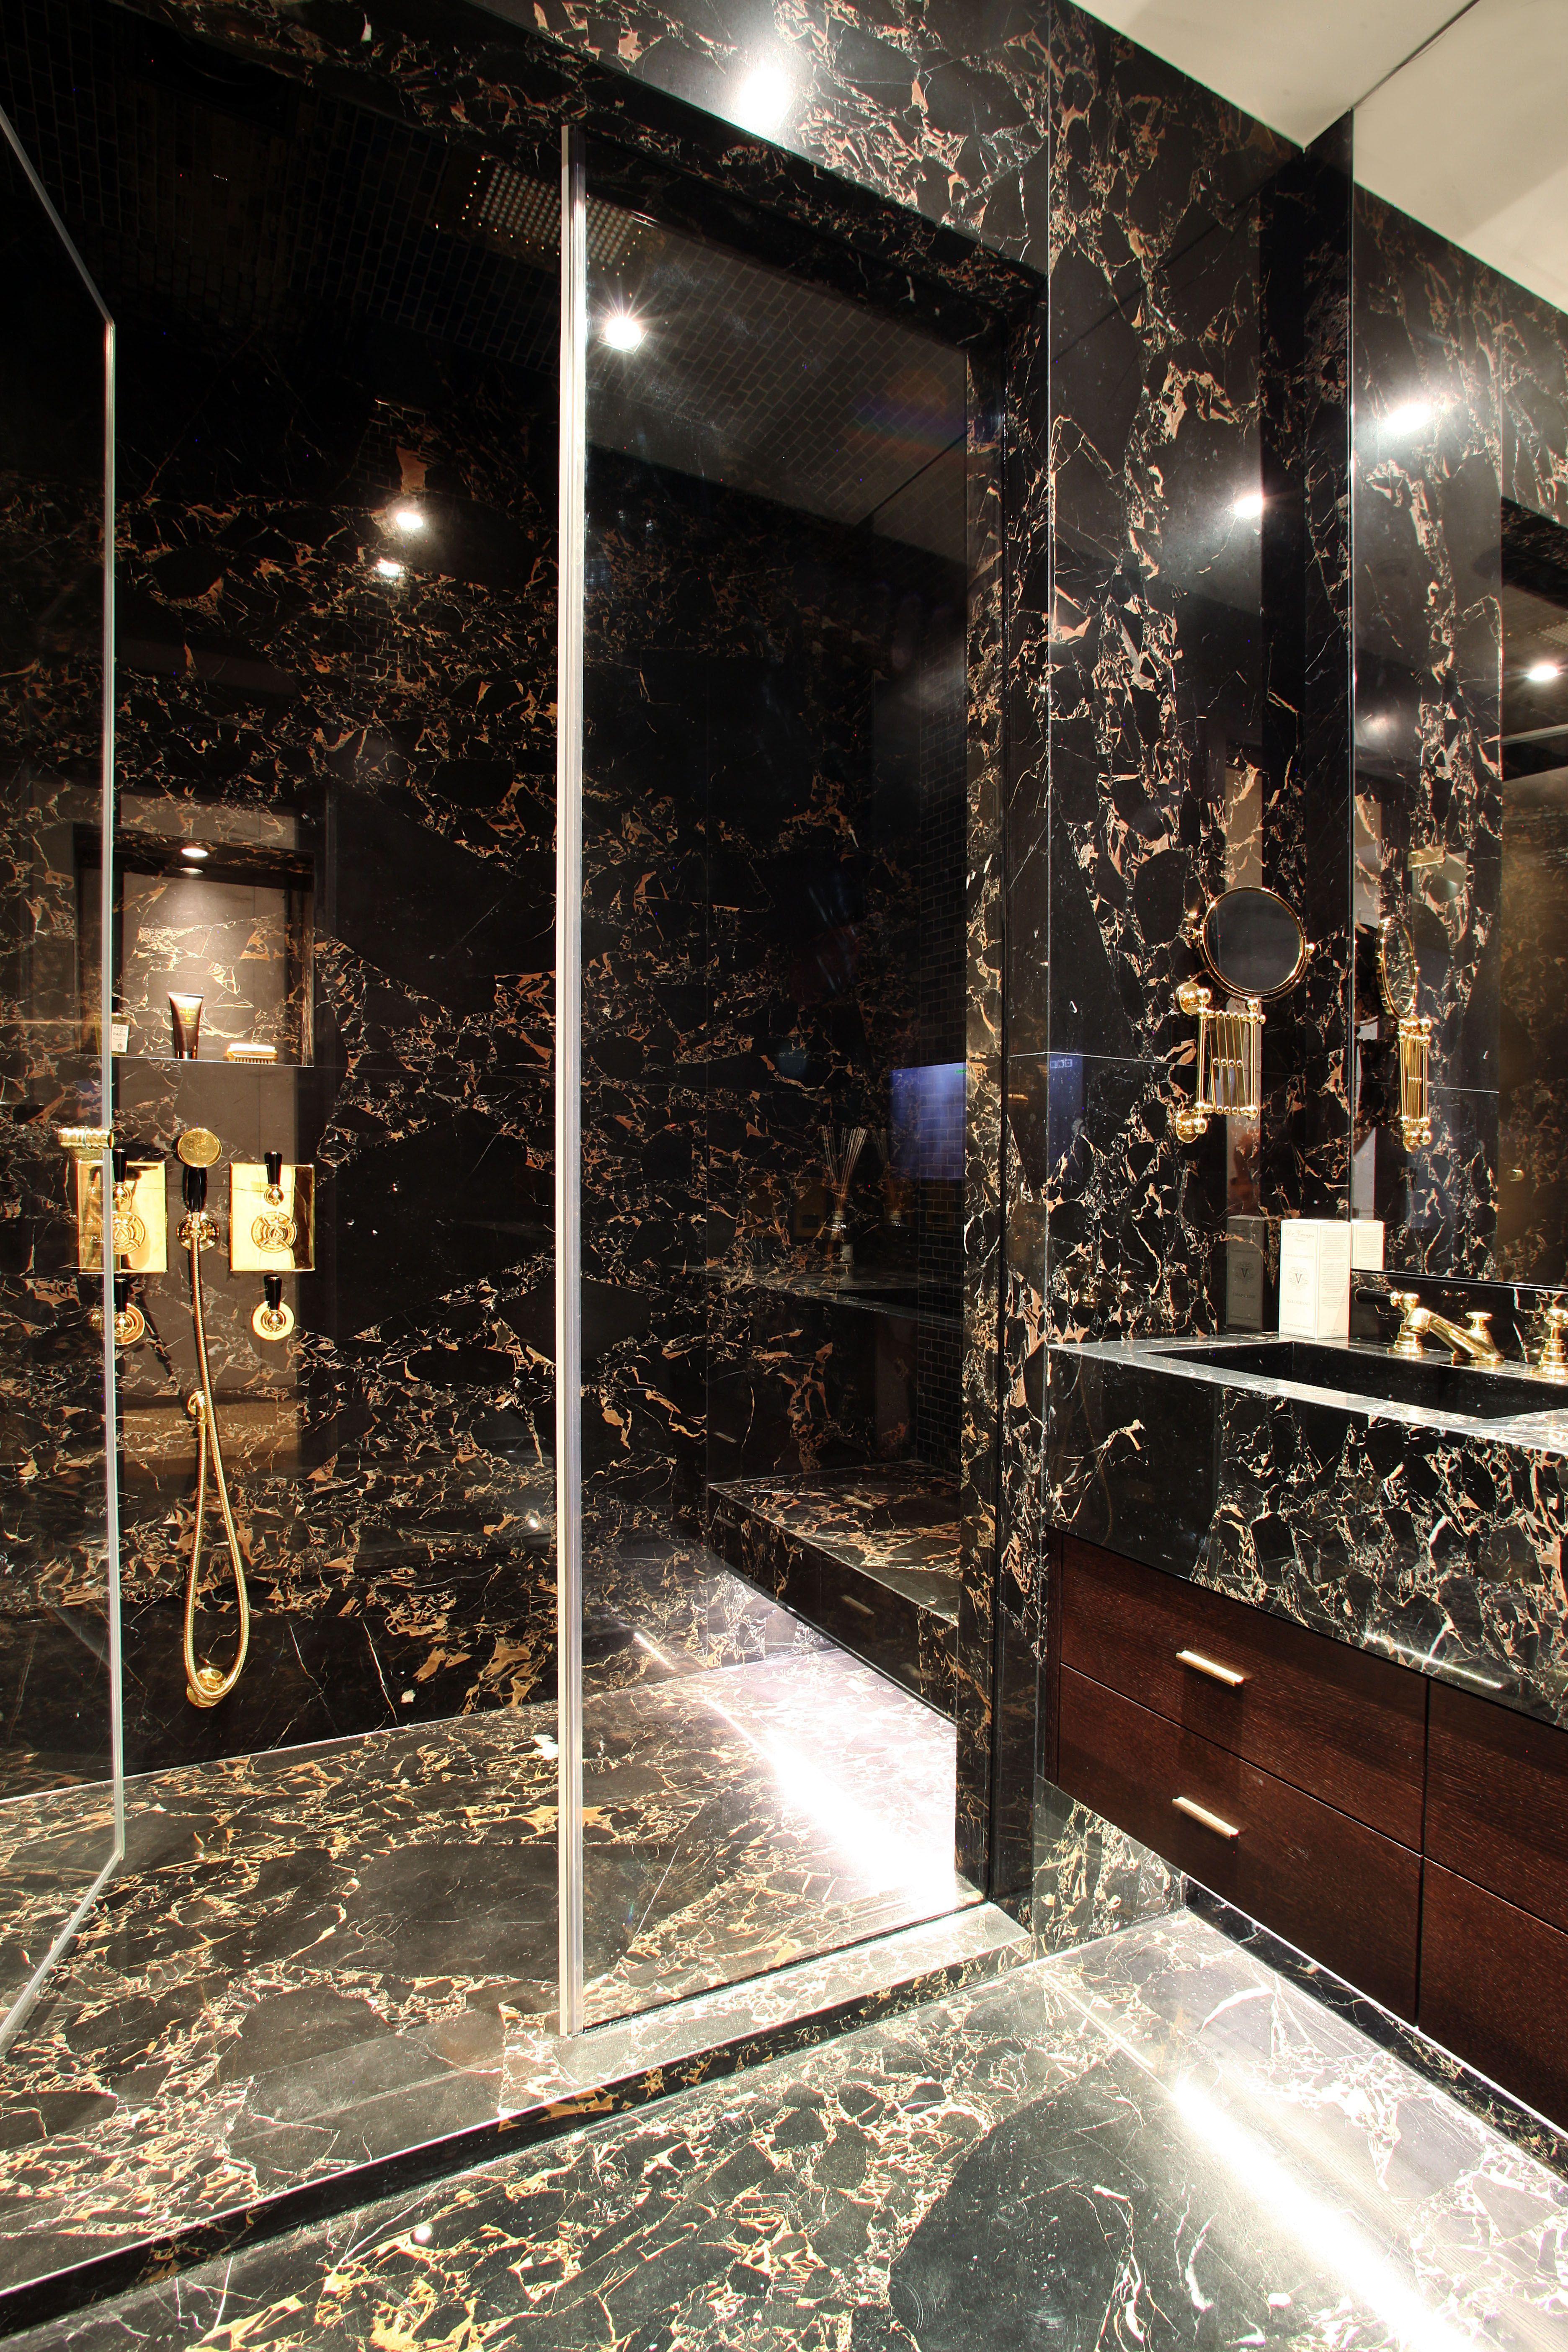 Stylish Bathroom Decor Ideas. Dazzling Design Projects From DelightFULL |  Http://www.delightfull.eu/usa/. Mid Century Modern Lighting: Ceiling Lights,  ...